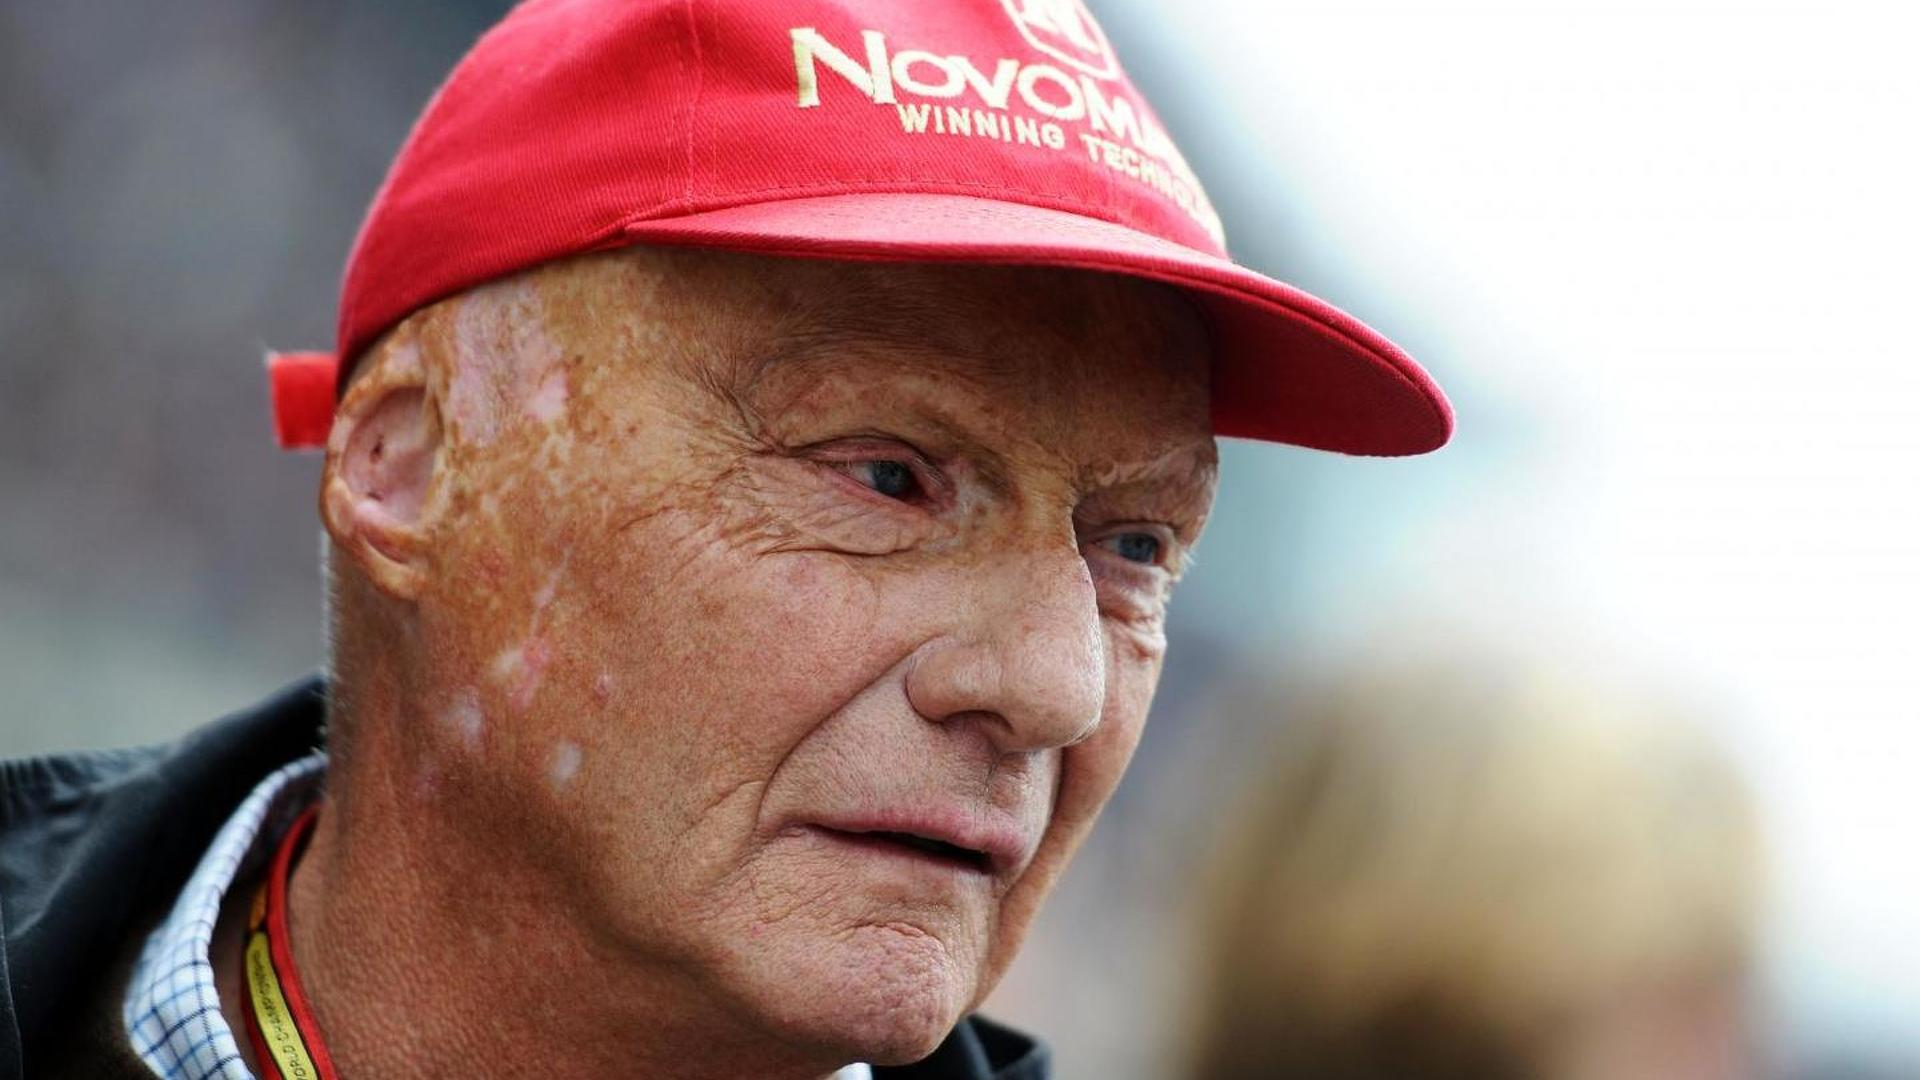 Lauda furious as Red Bull drop name from F1 circuit